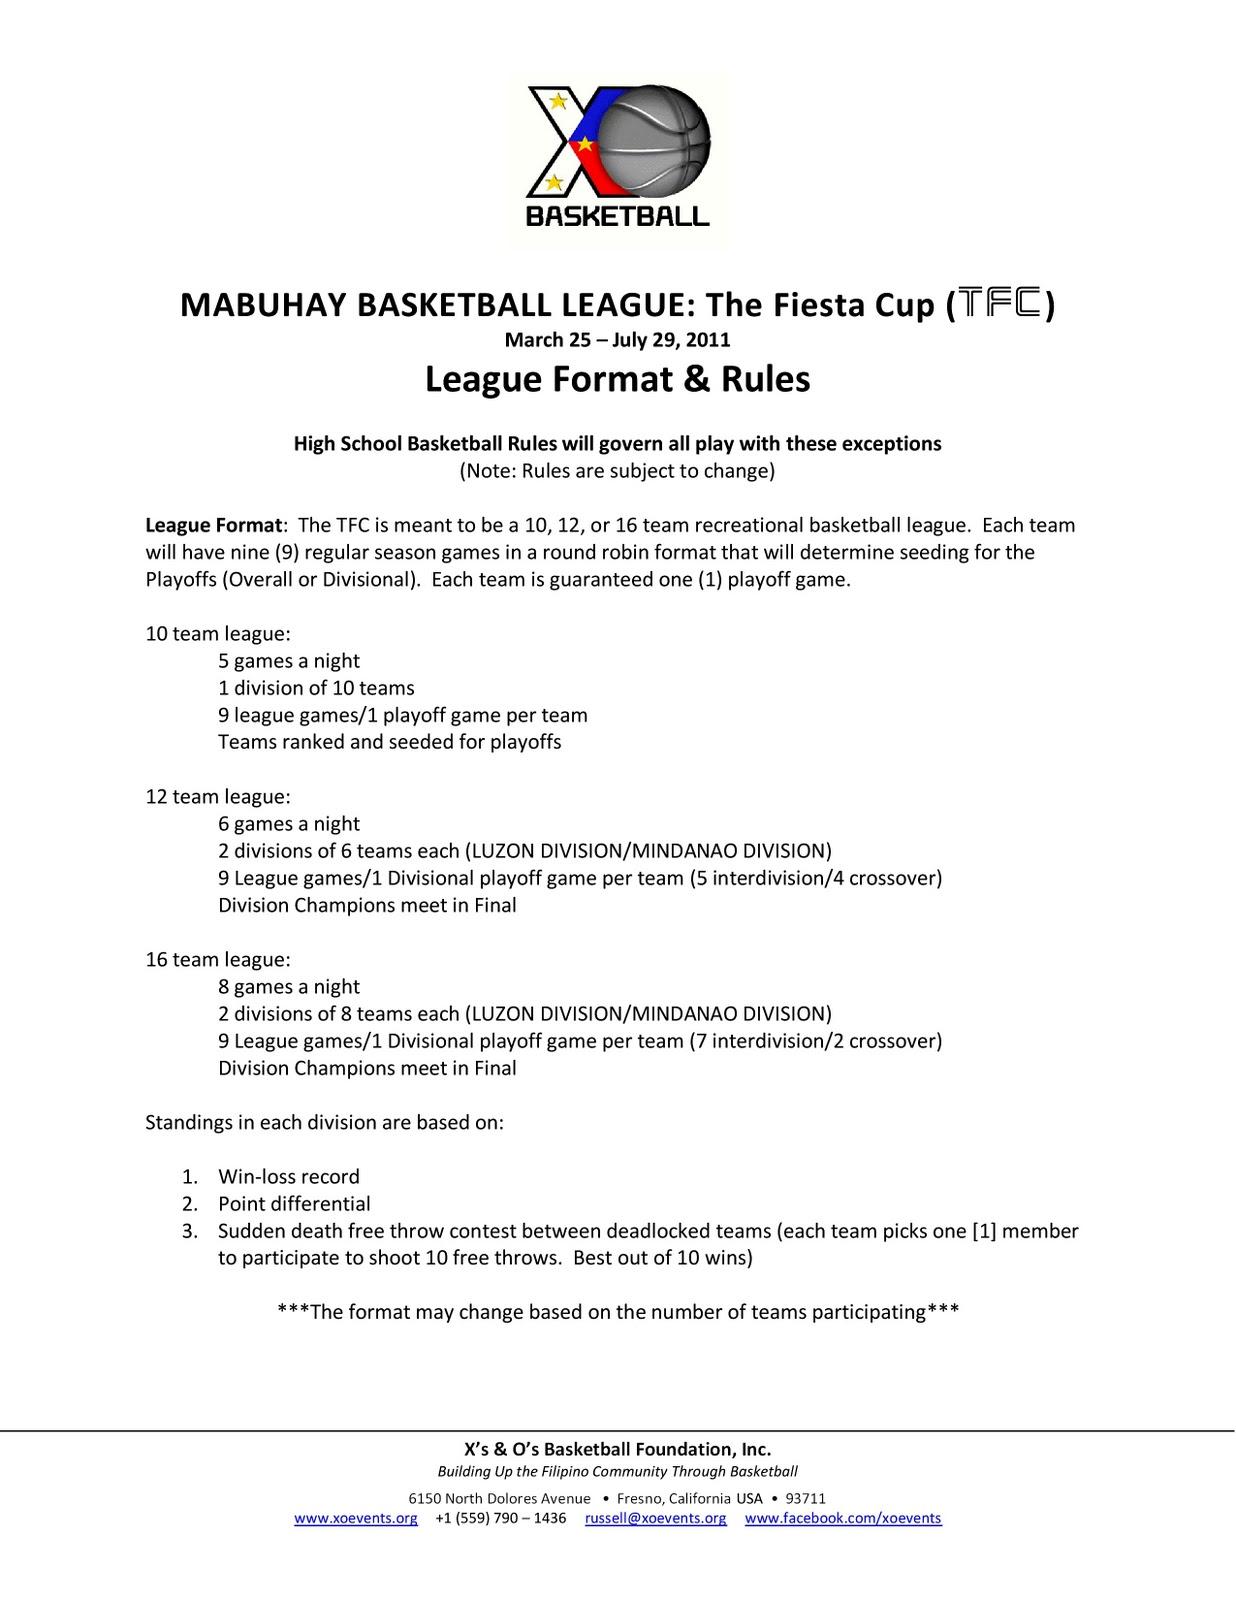 Basketball registration form template eliolera the coachu0027s box by xu0027s u0026 ou0027s basketball february 2011 pronofoot35fo Gallery